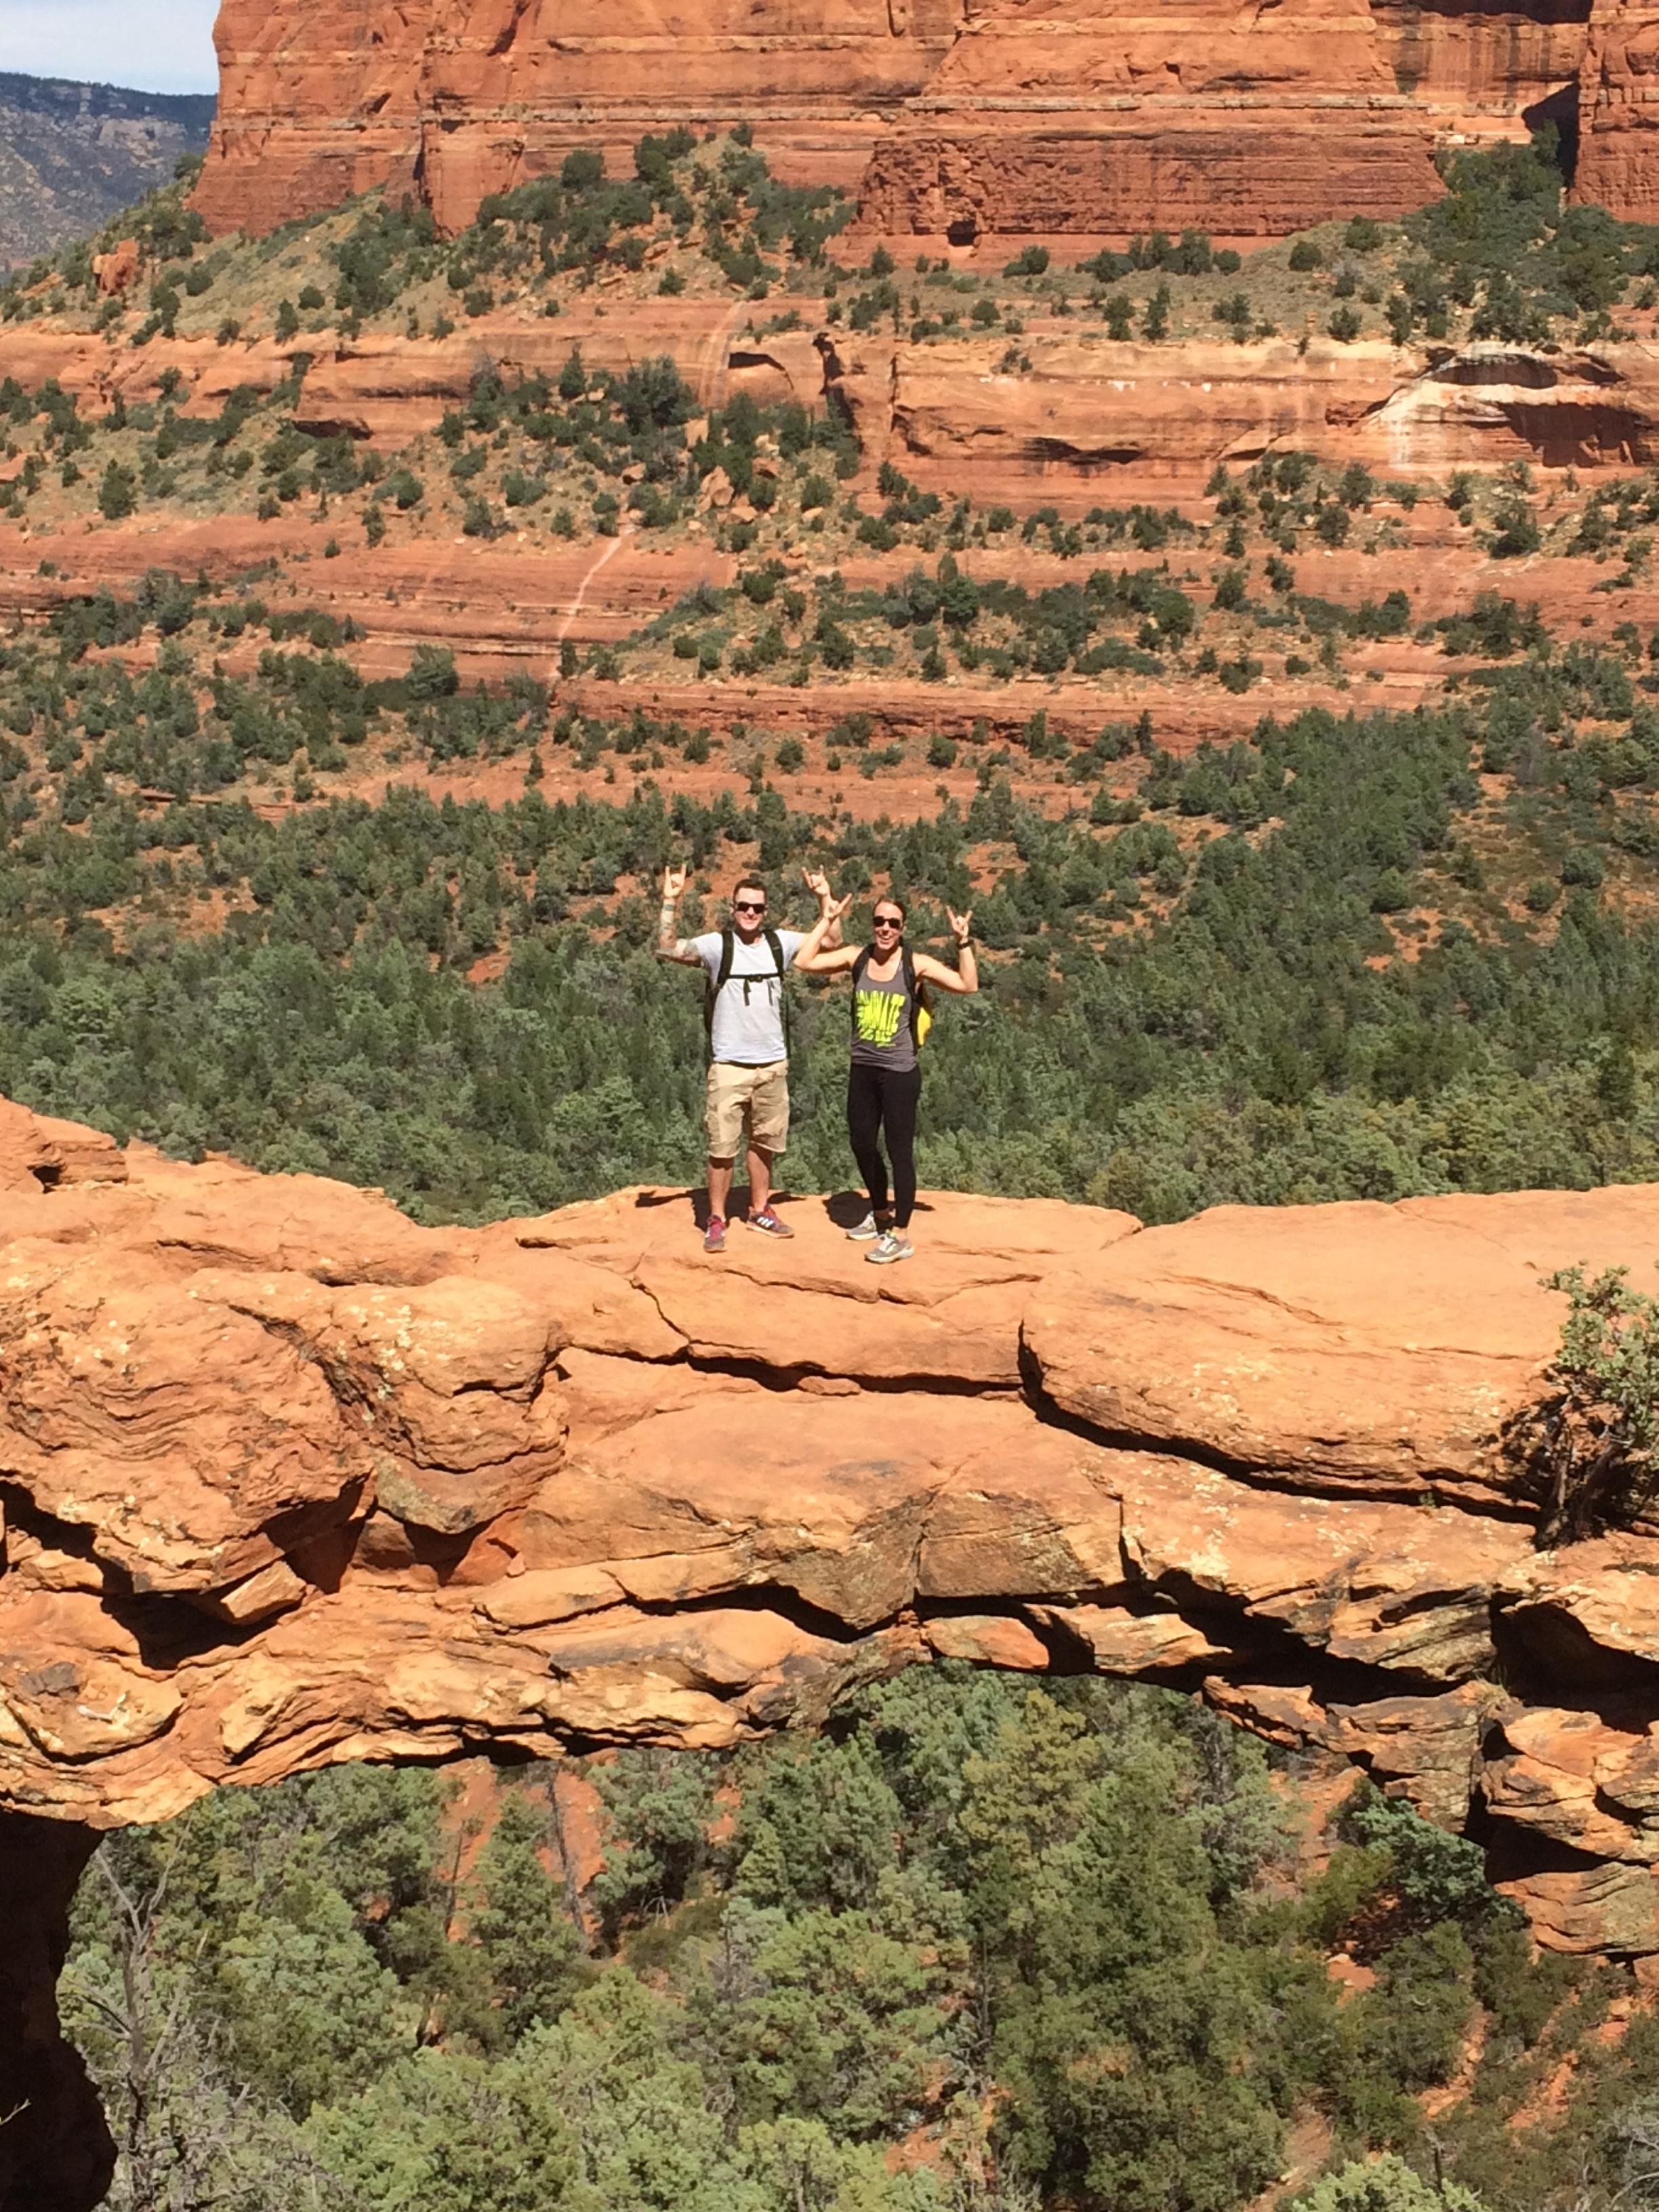 Killing a hike with my wife in Sedona, AZ